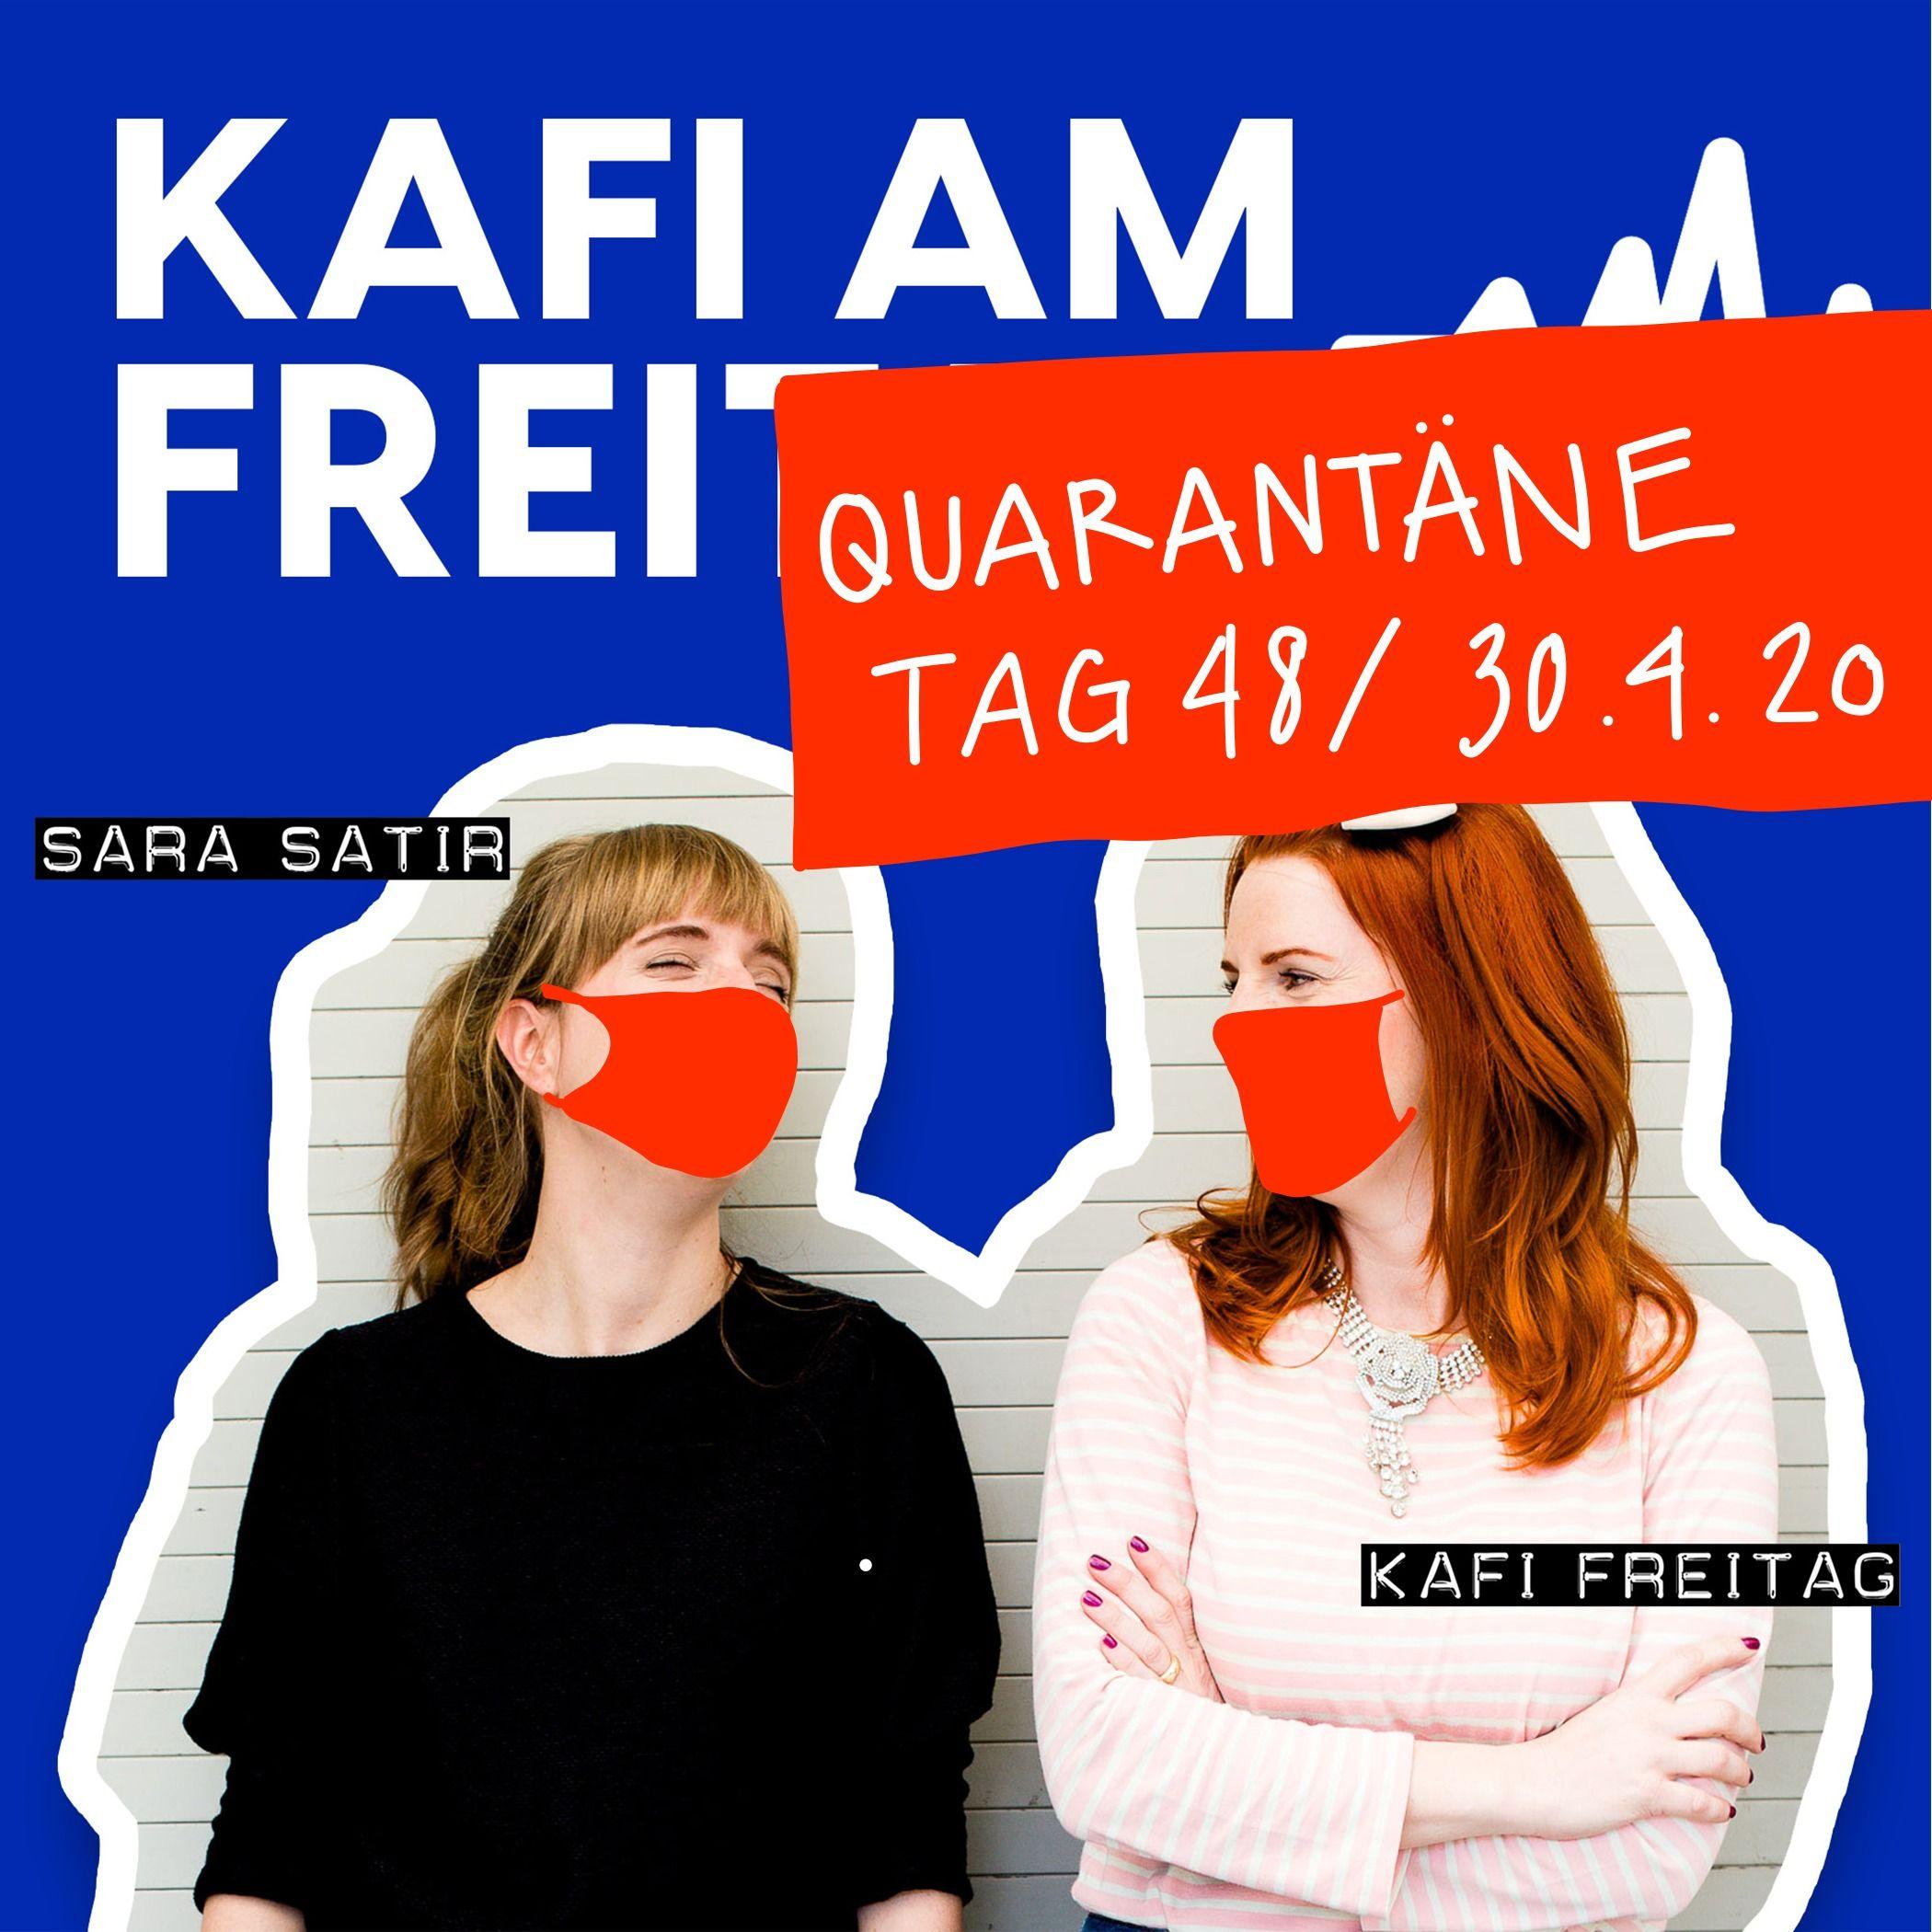 Frag Kafi, wenns um Corona geht. / Quarantäne Tag 48 - 30.4.20